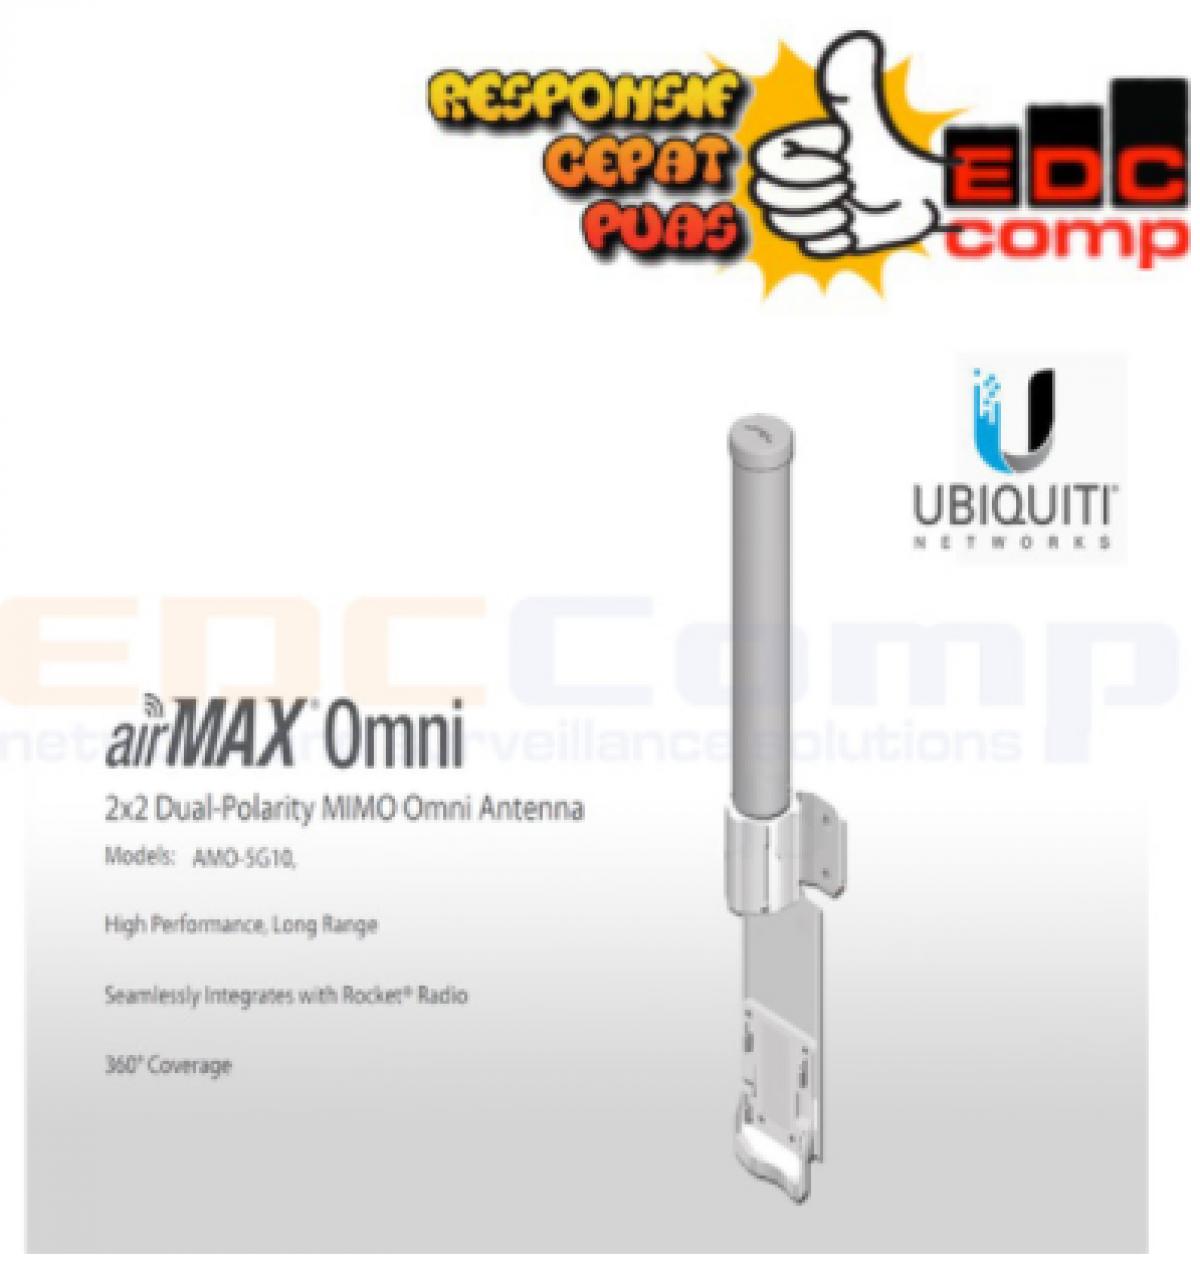 Ubiquiti Antenna Omni Airmax 5Ghz 10dbi AMO-5G10 - EdcComp